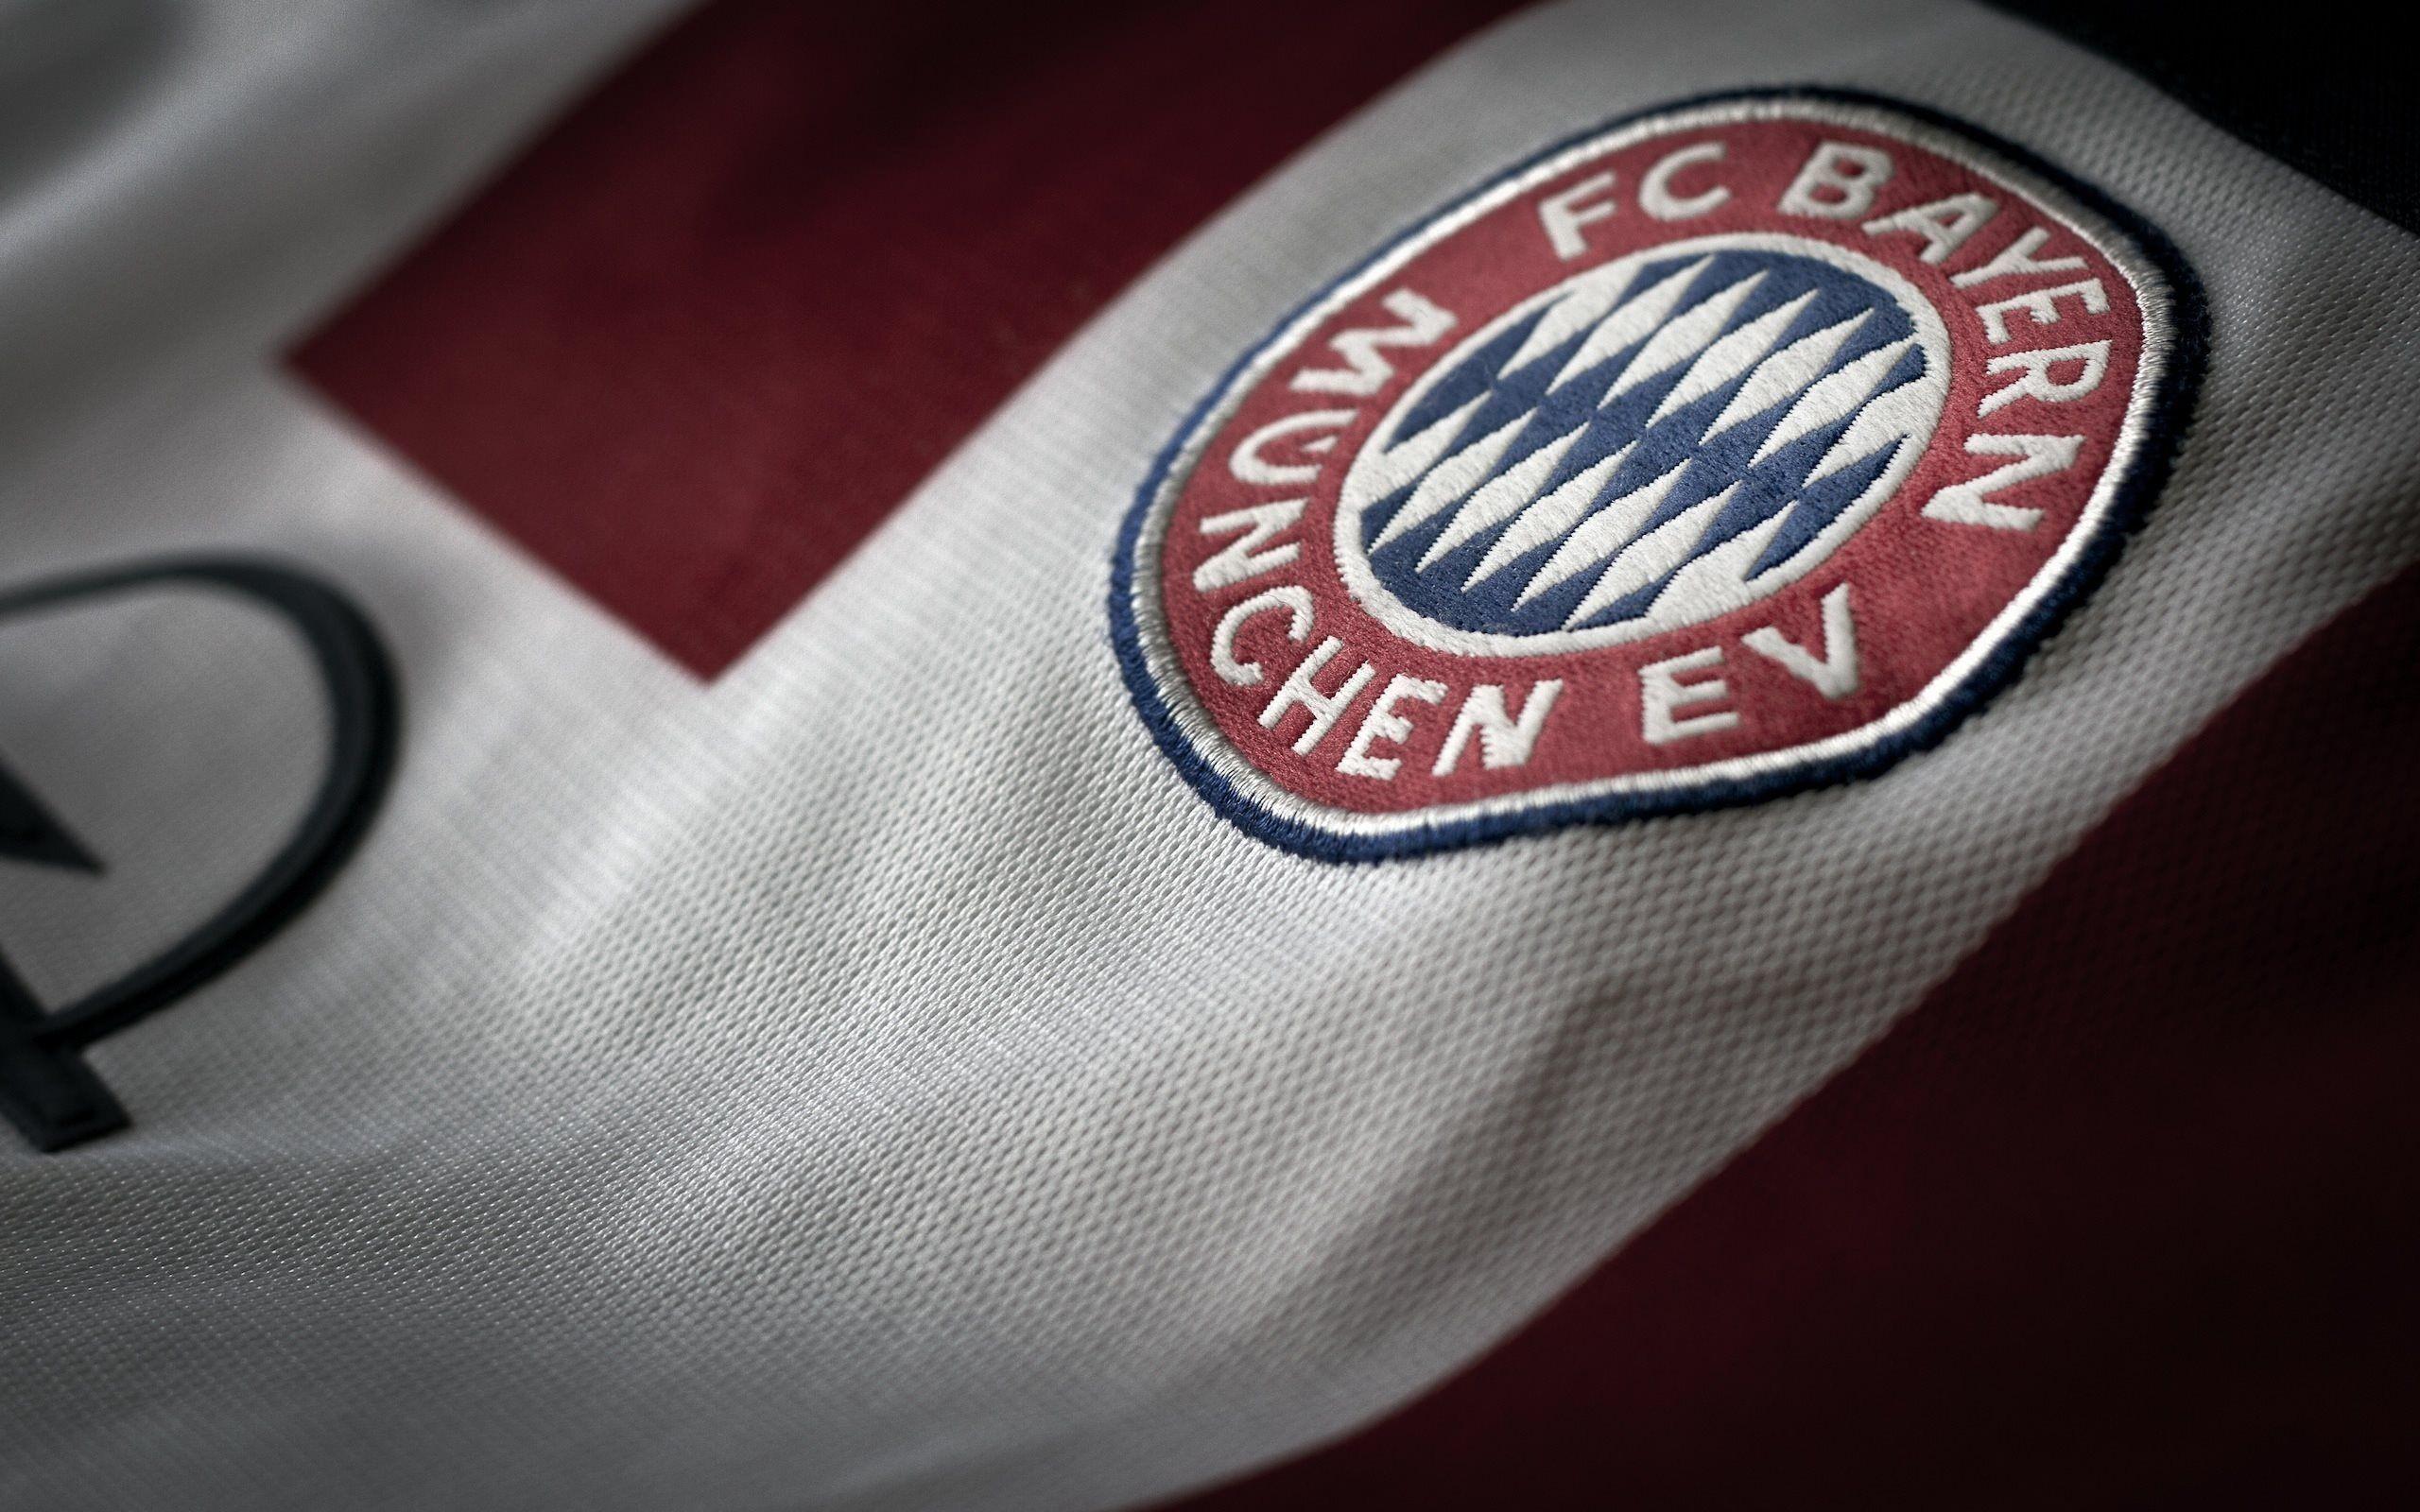 Bayern munich wallpaper free download.